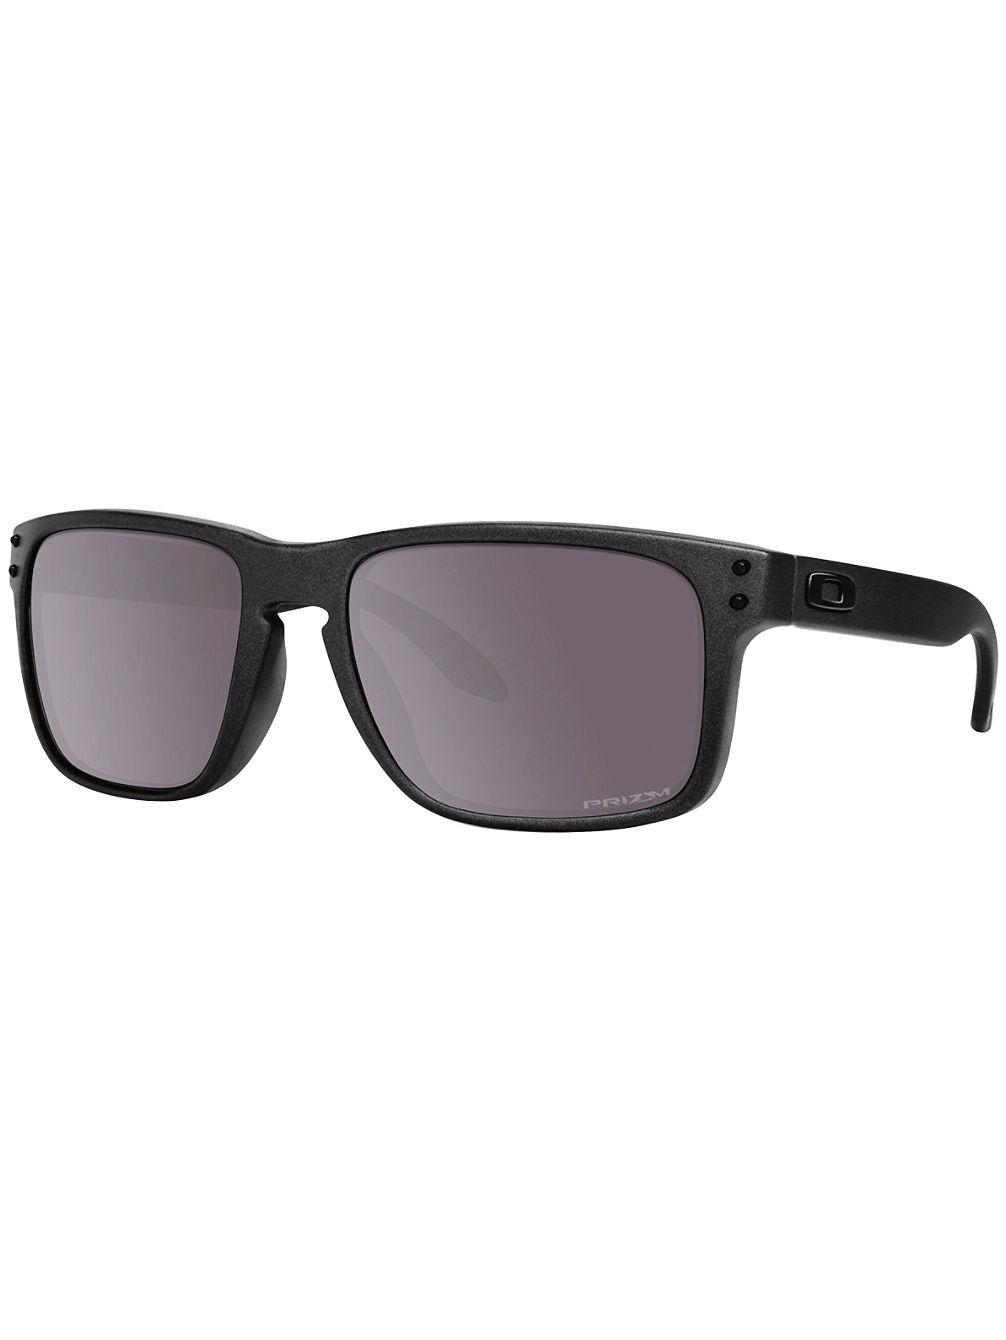 b41907fd27a Oakley Holbrook Steel Prizm Shade Sonnenbrille online kaufen bei  www.cinemas93.org